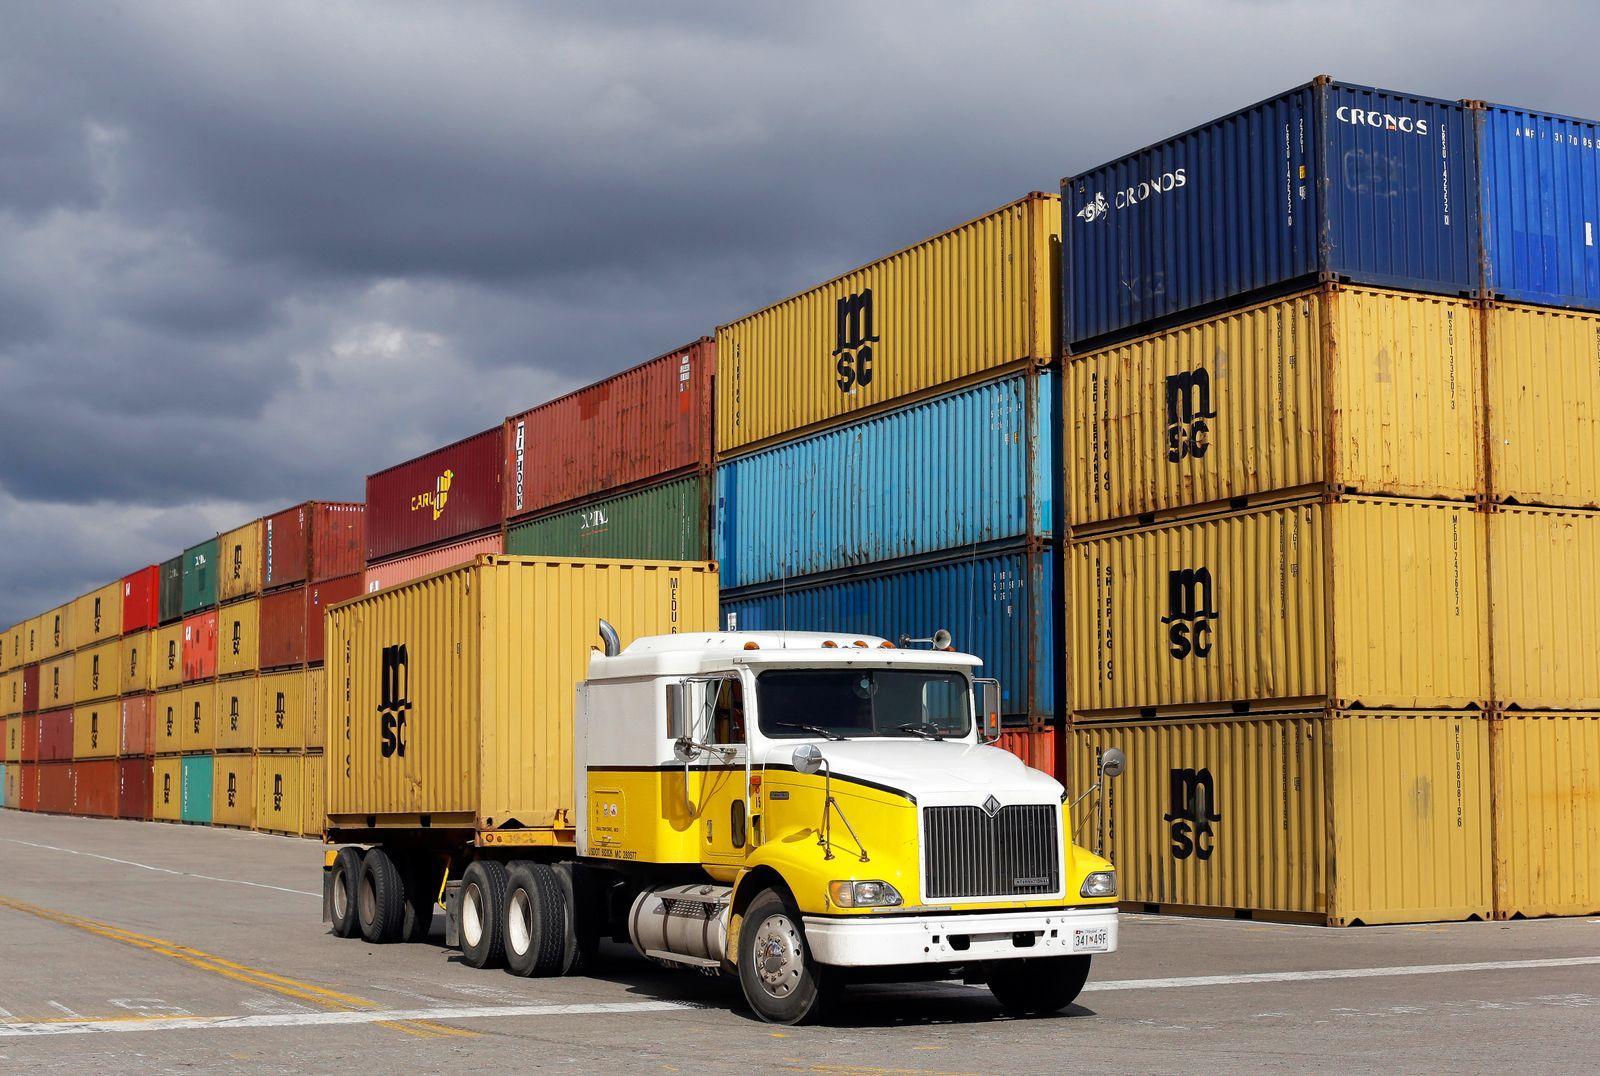 USA / Container / Handel / Konjunktur / Export